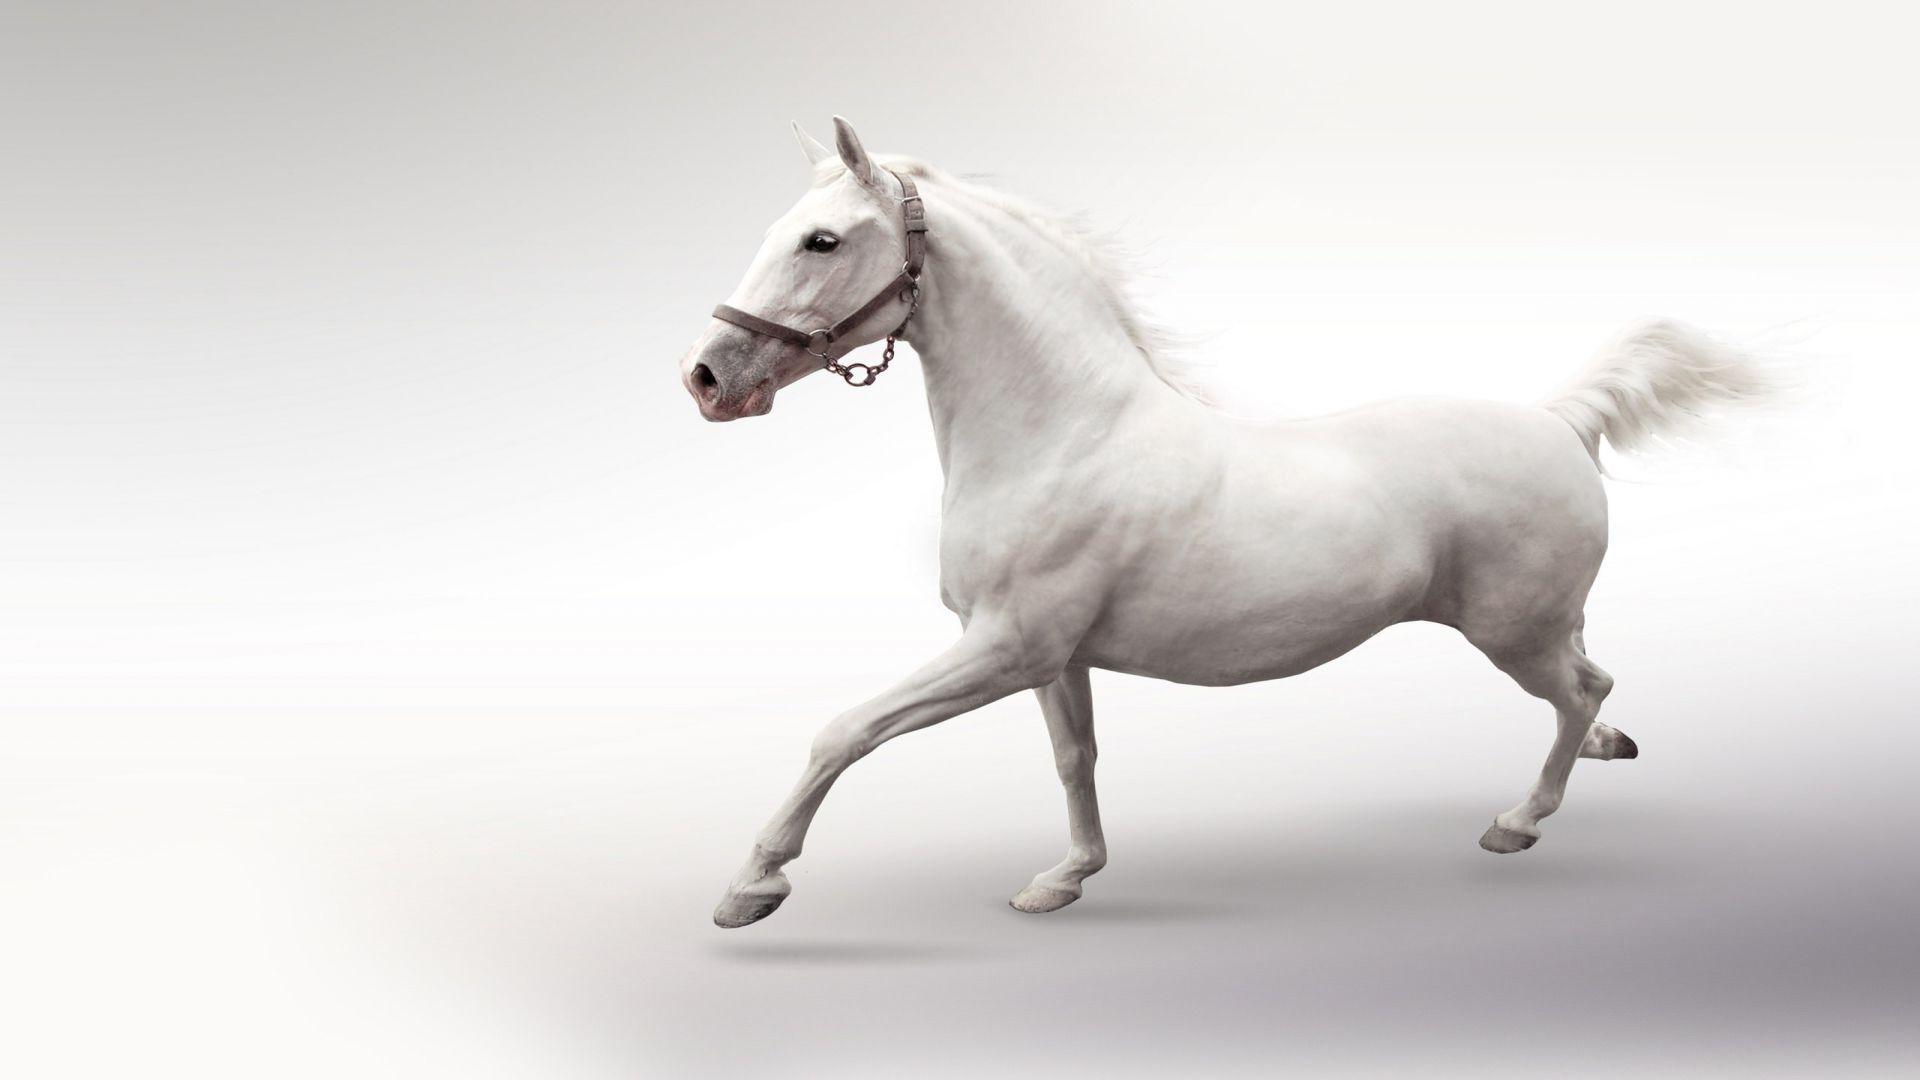 Fantastic Wallpaper Horse Windows - e79a026efb12554cfec3710cde900ea7  Photograph_85837.jpg